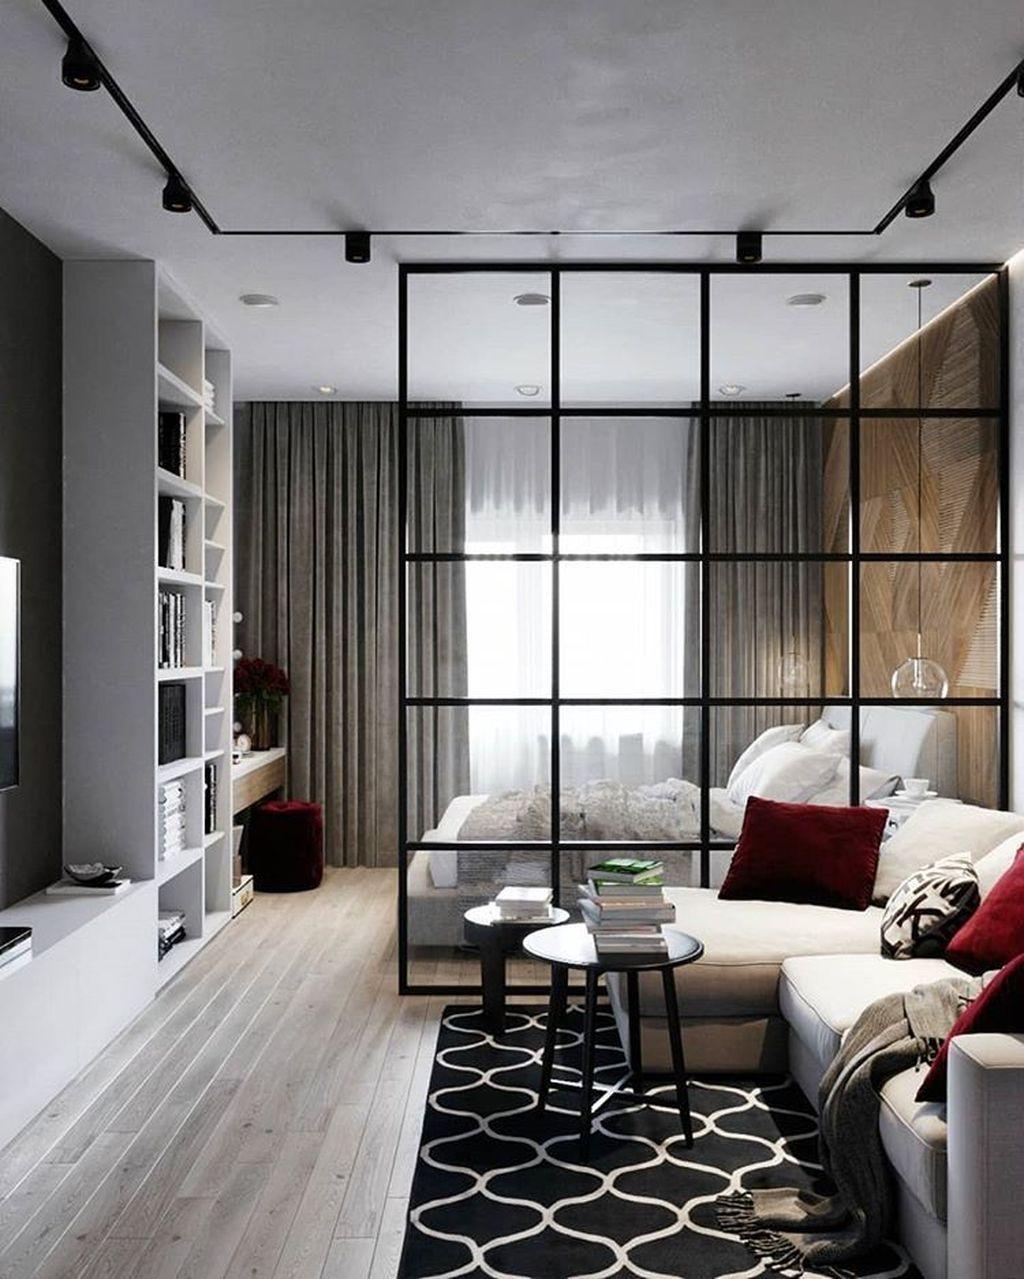 Awesome 20 Fabulous Studio Apartment Decor Ideas On A Budget Studio Apartment Living Small Apartment Interior Studio Apartment Decorating